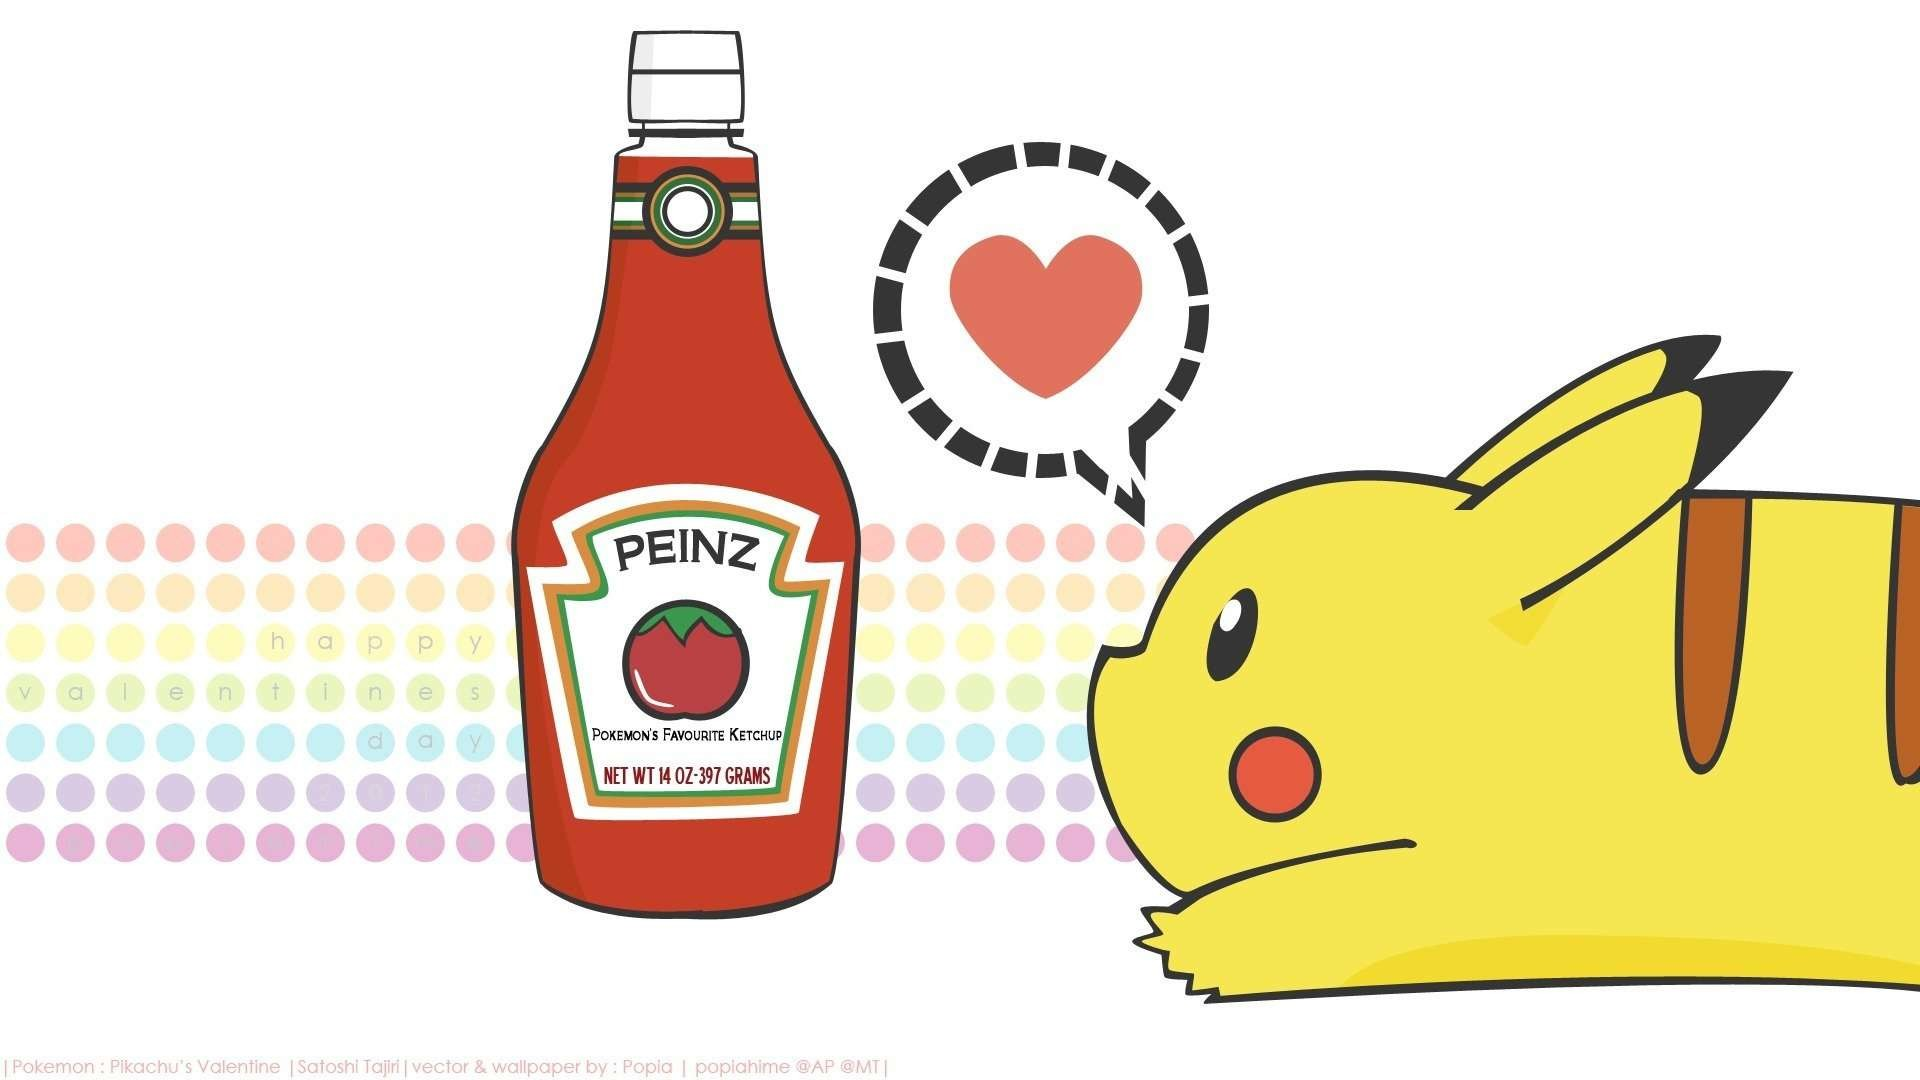 pikachu with ketchup wallpaper